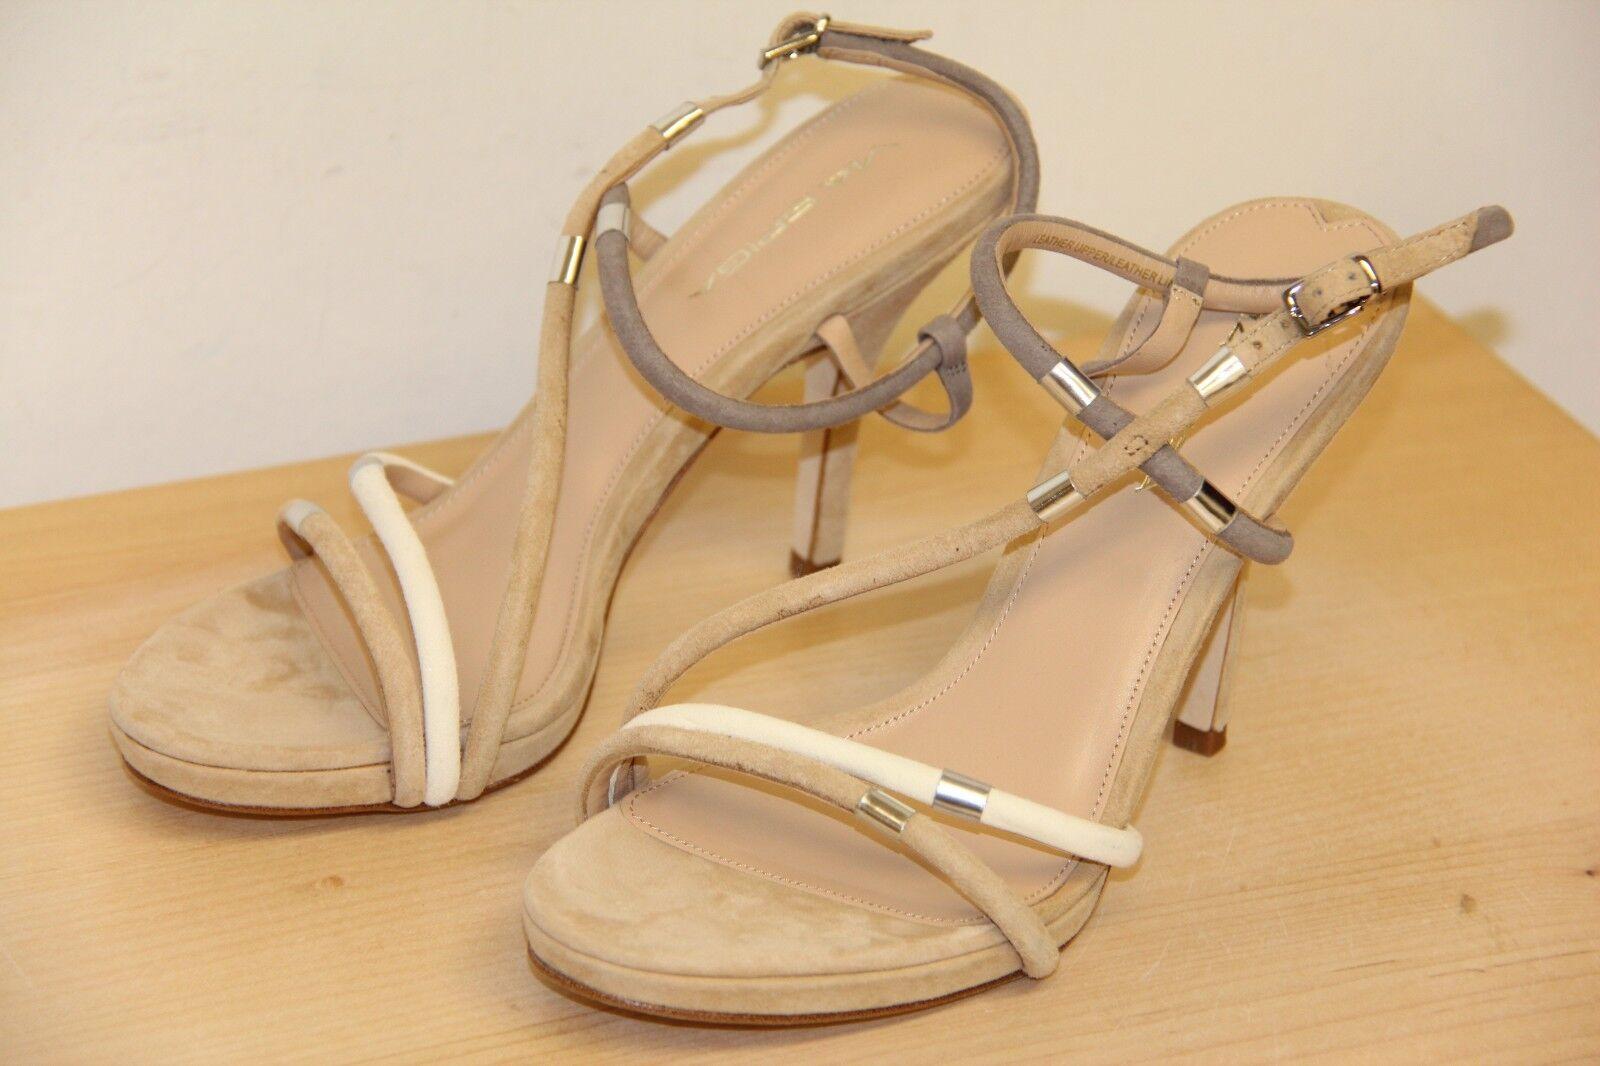 NIB Via Spiga GENE Suede Suede Suede Open Peep Toe Sandals Sz 8 M Cappuccino grau Cream 1e05f3